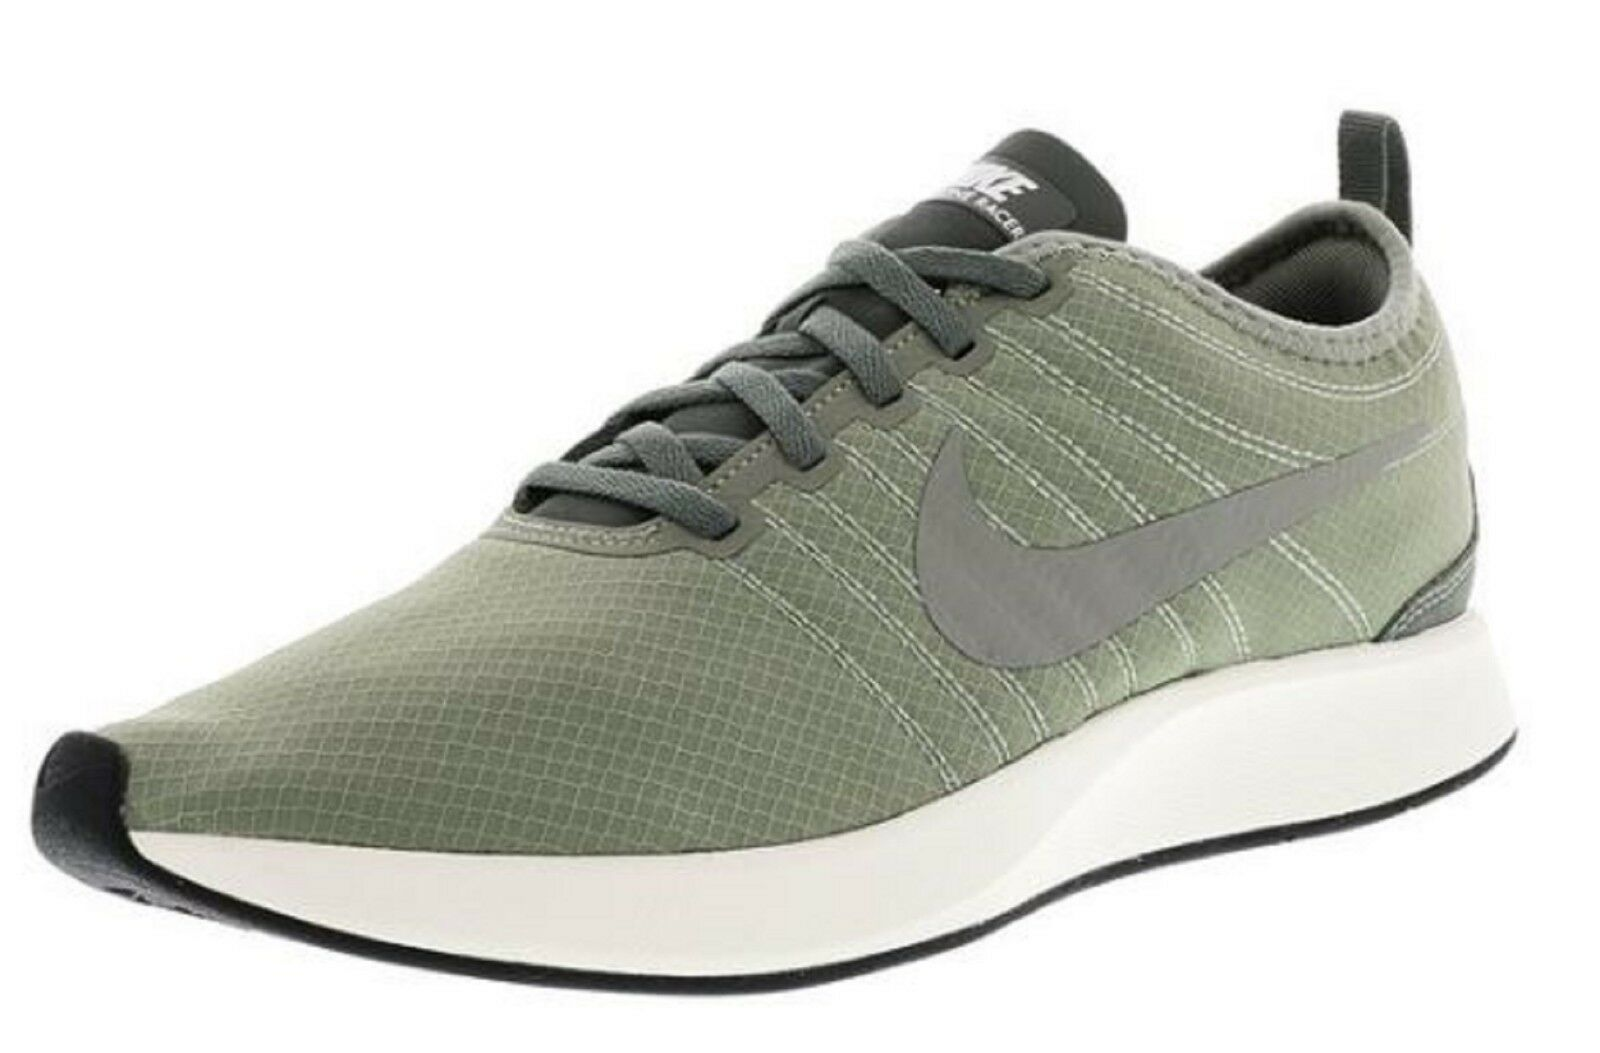 Nike se nuove Uomo dualtone racer se Nike caviglia alta scarpe da corsa 922170 sz 12 95 dollari 0a35db